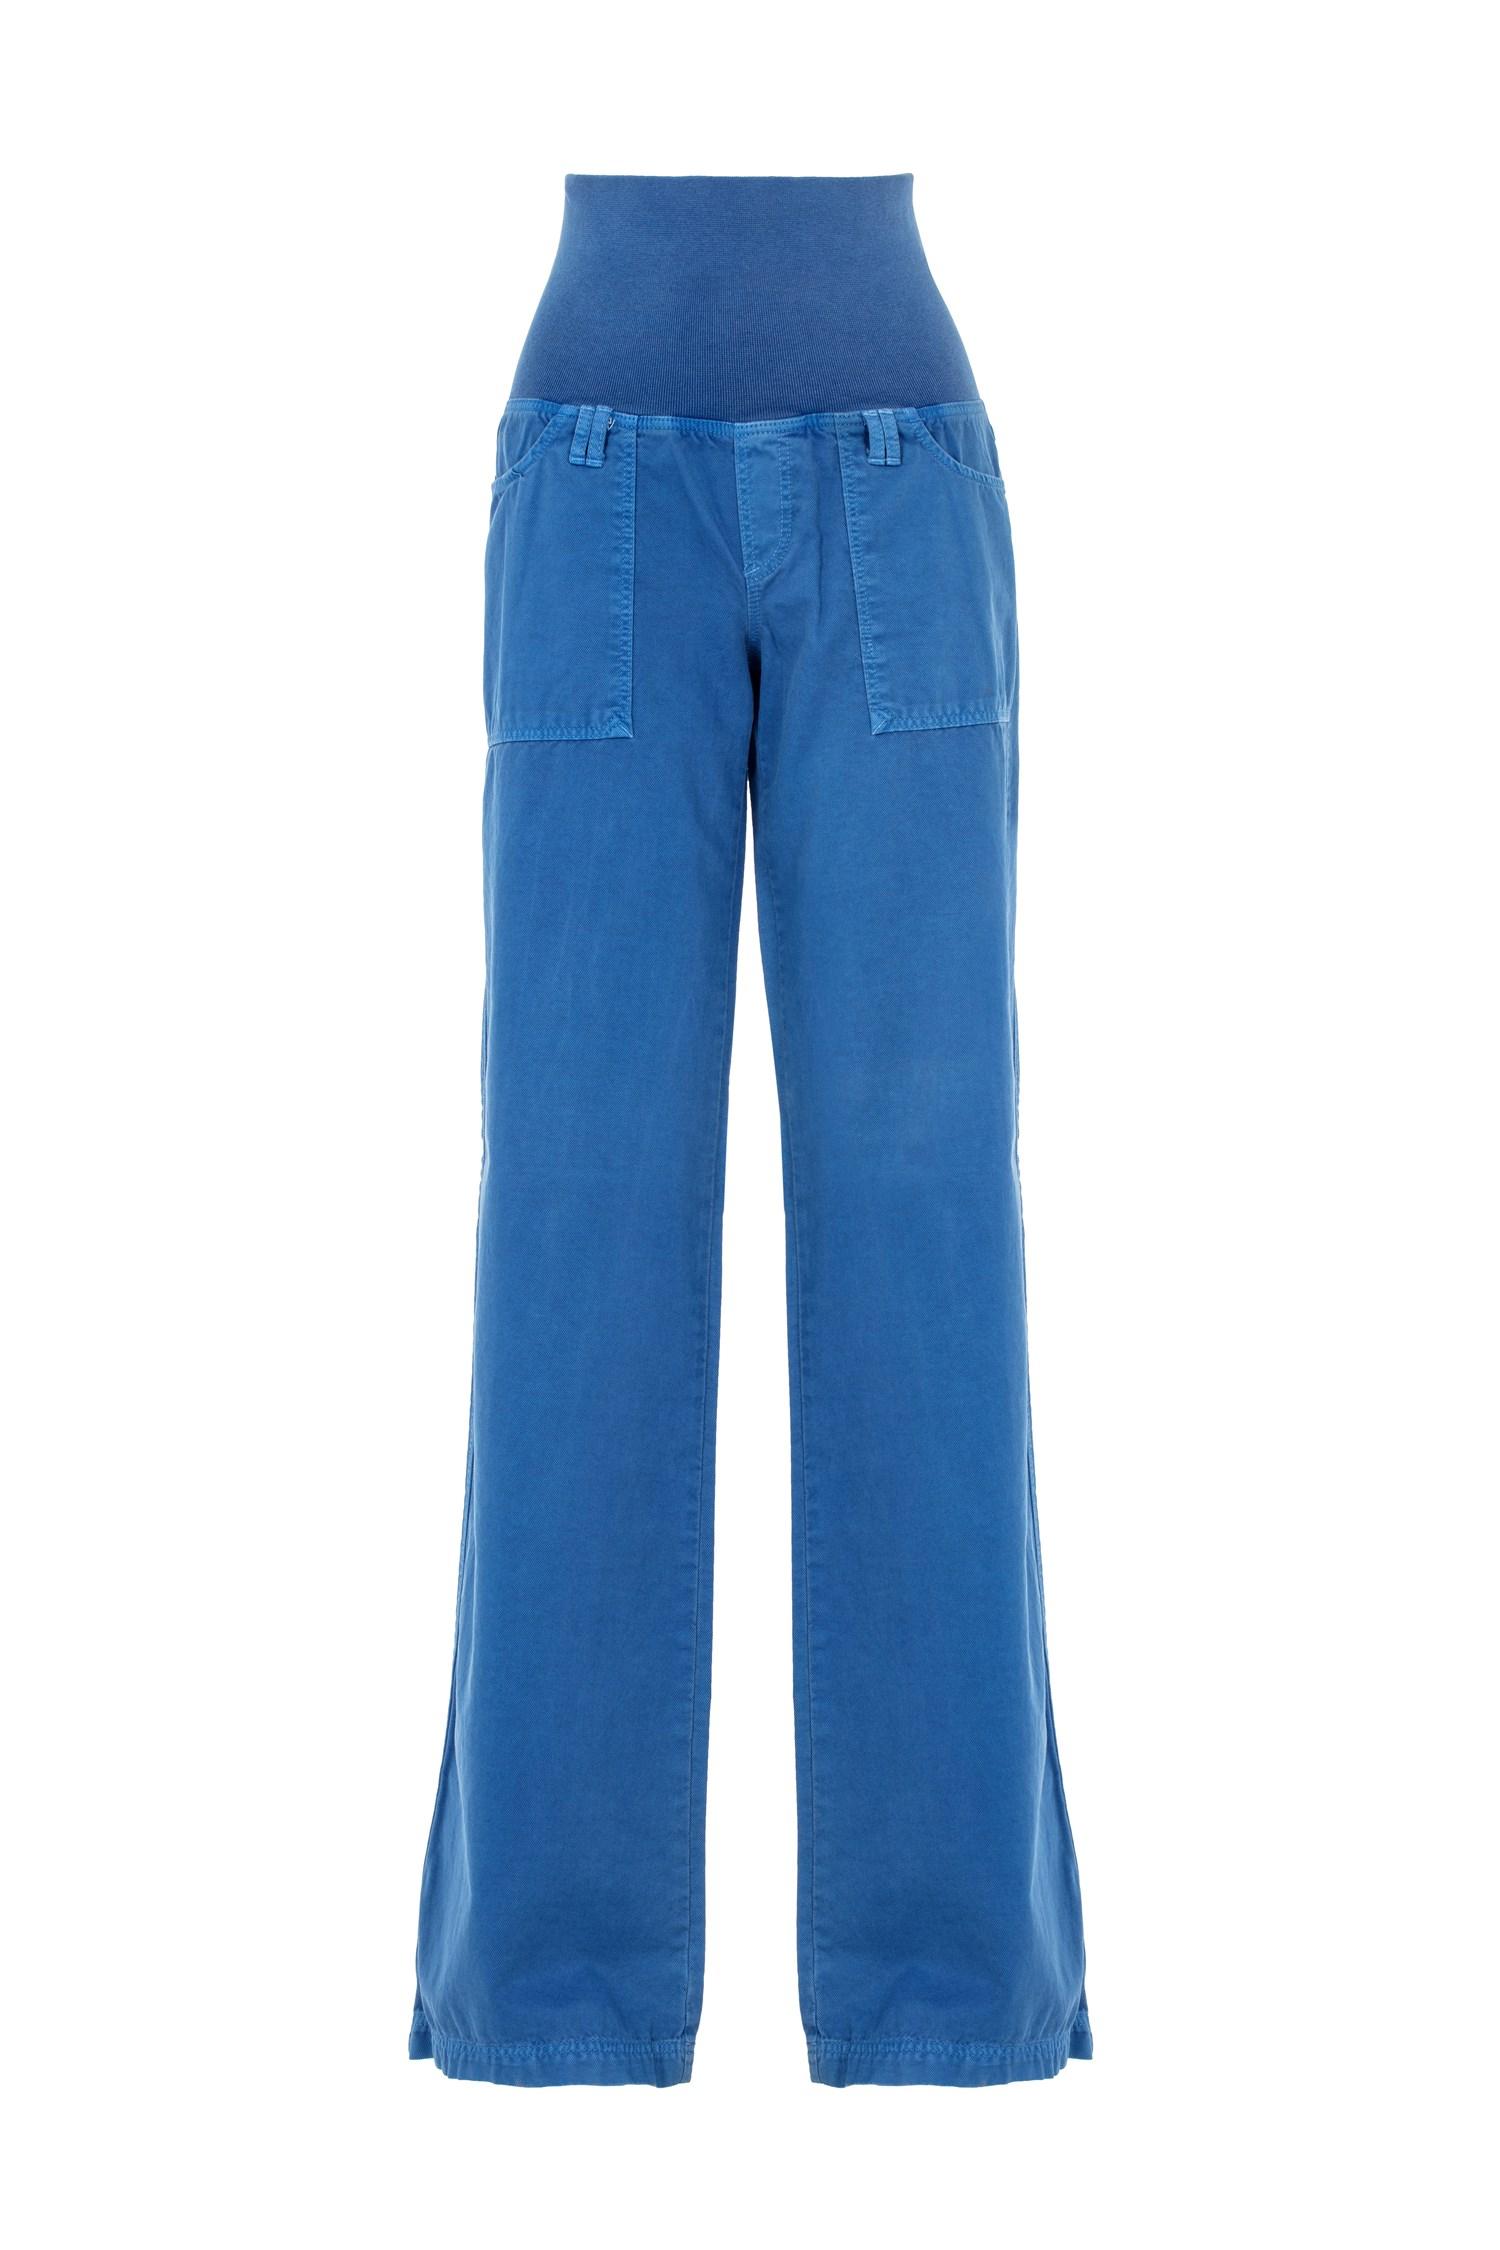 Bayan Mavi Beli Lastikli Bol Pantolon